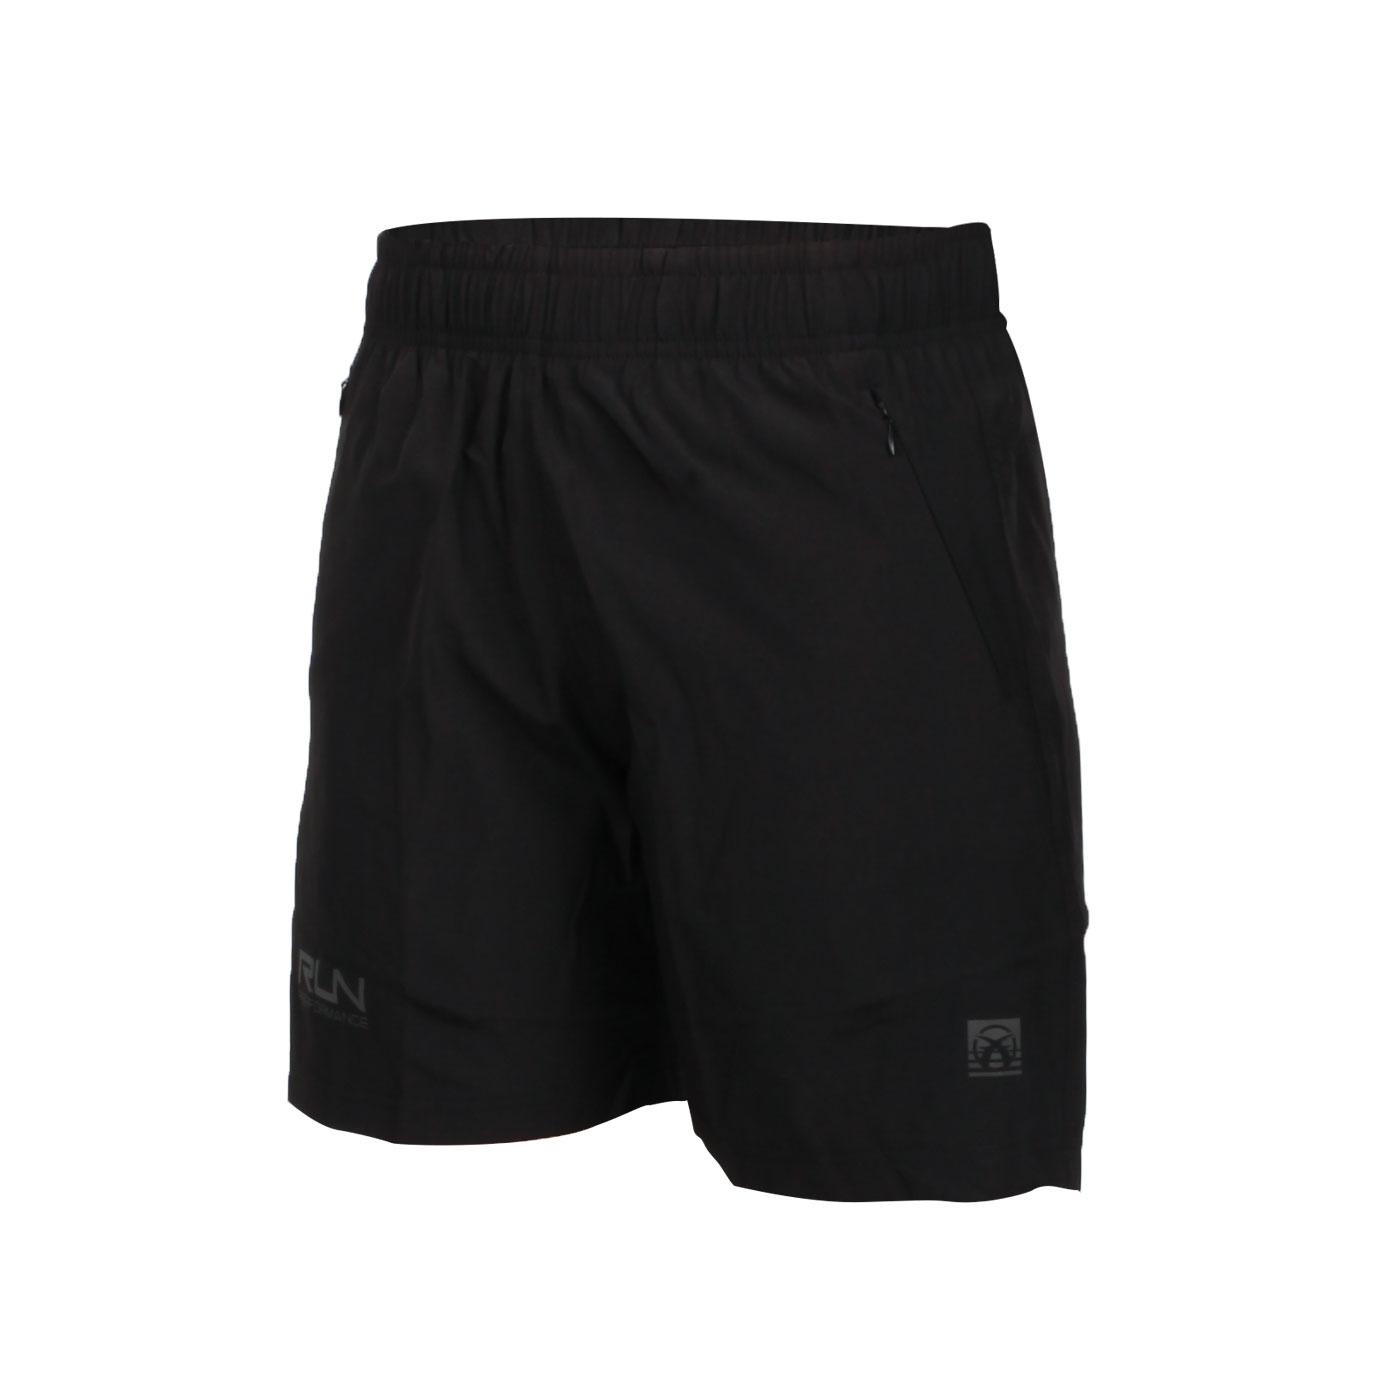 FIRESTAR 女款彈性平織短褲 CL025-10 - 黑